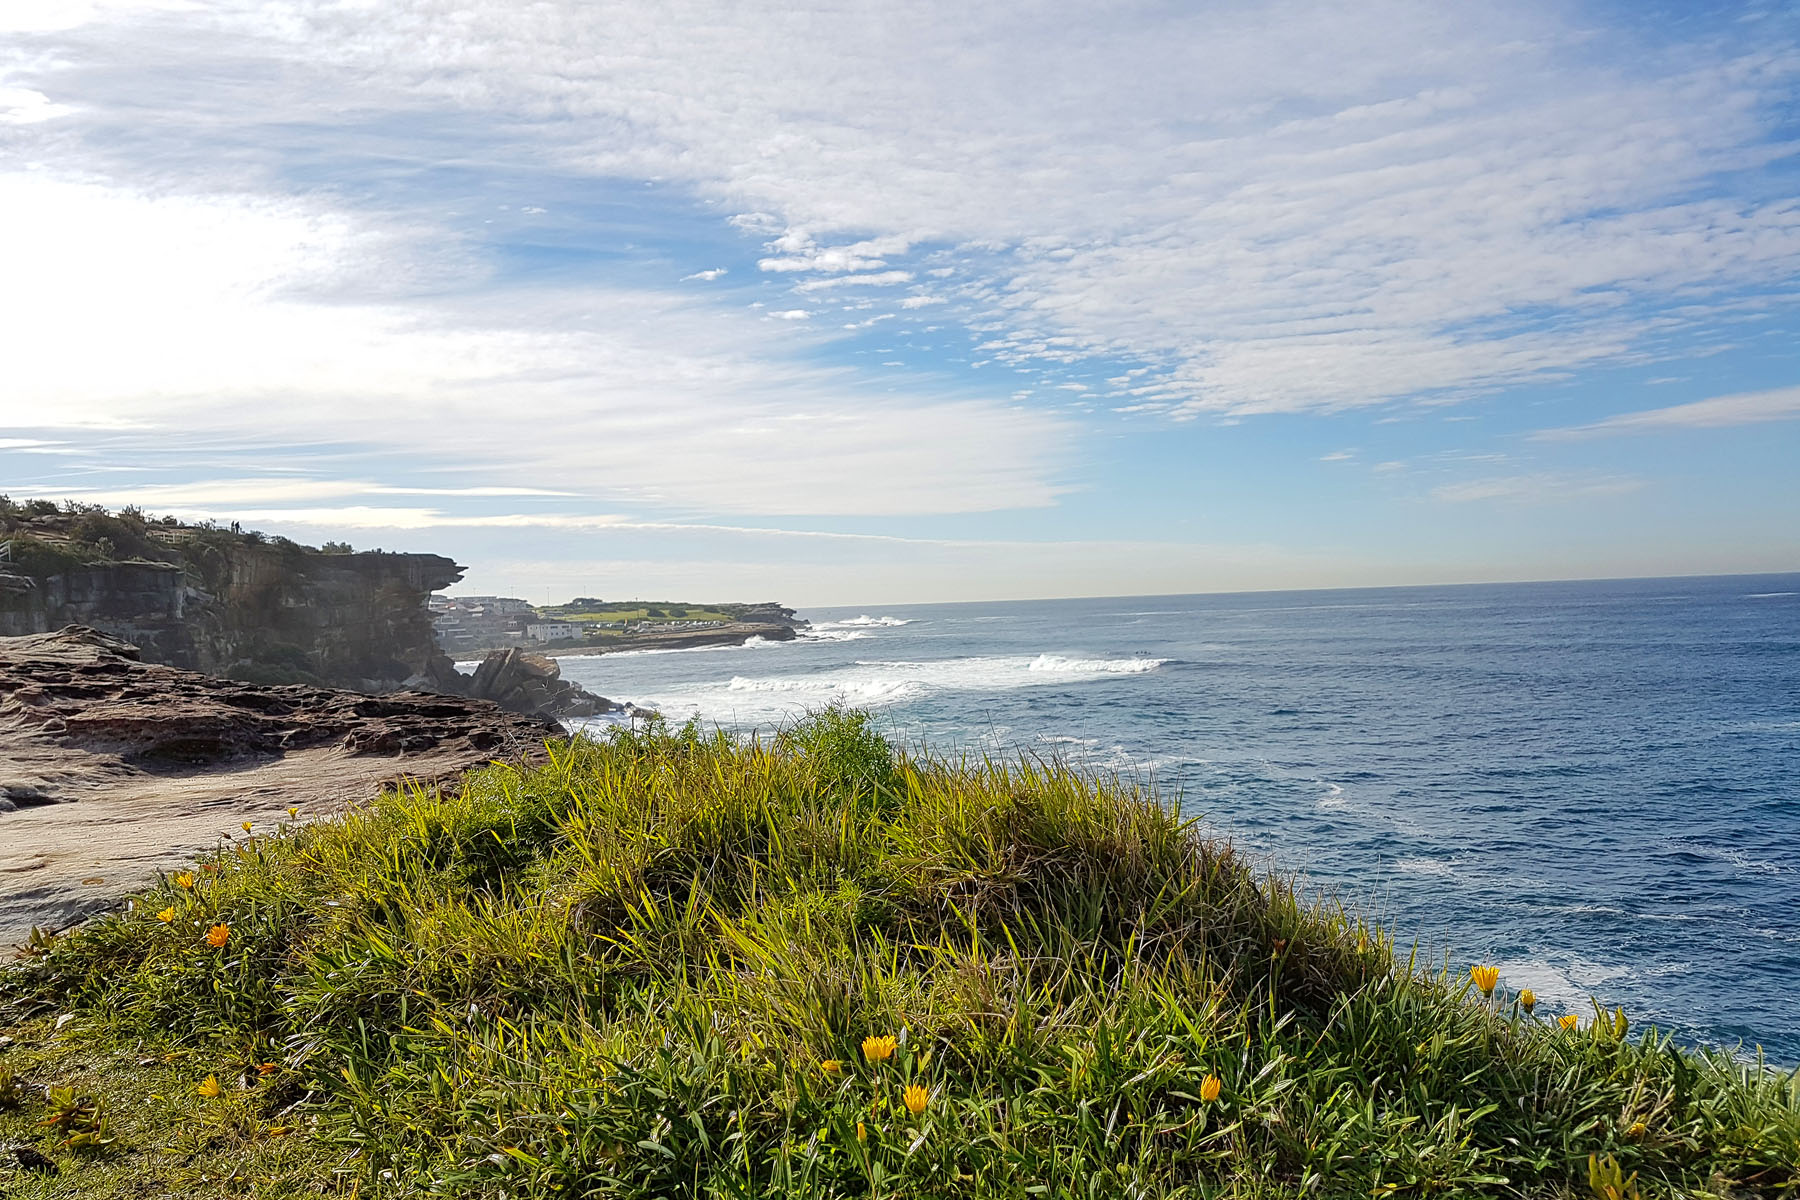 SGMT Australia Sydney_Bondi to Coogee Coastal Walk_07 Cliffs and flowers